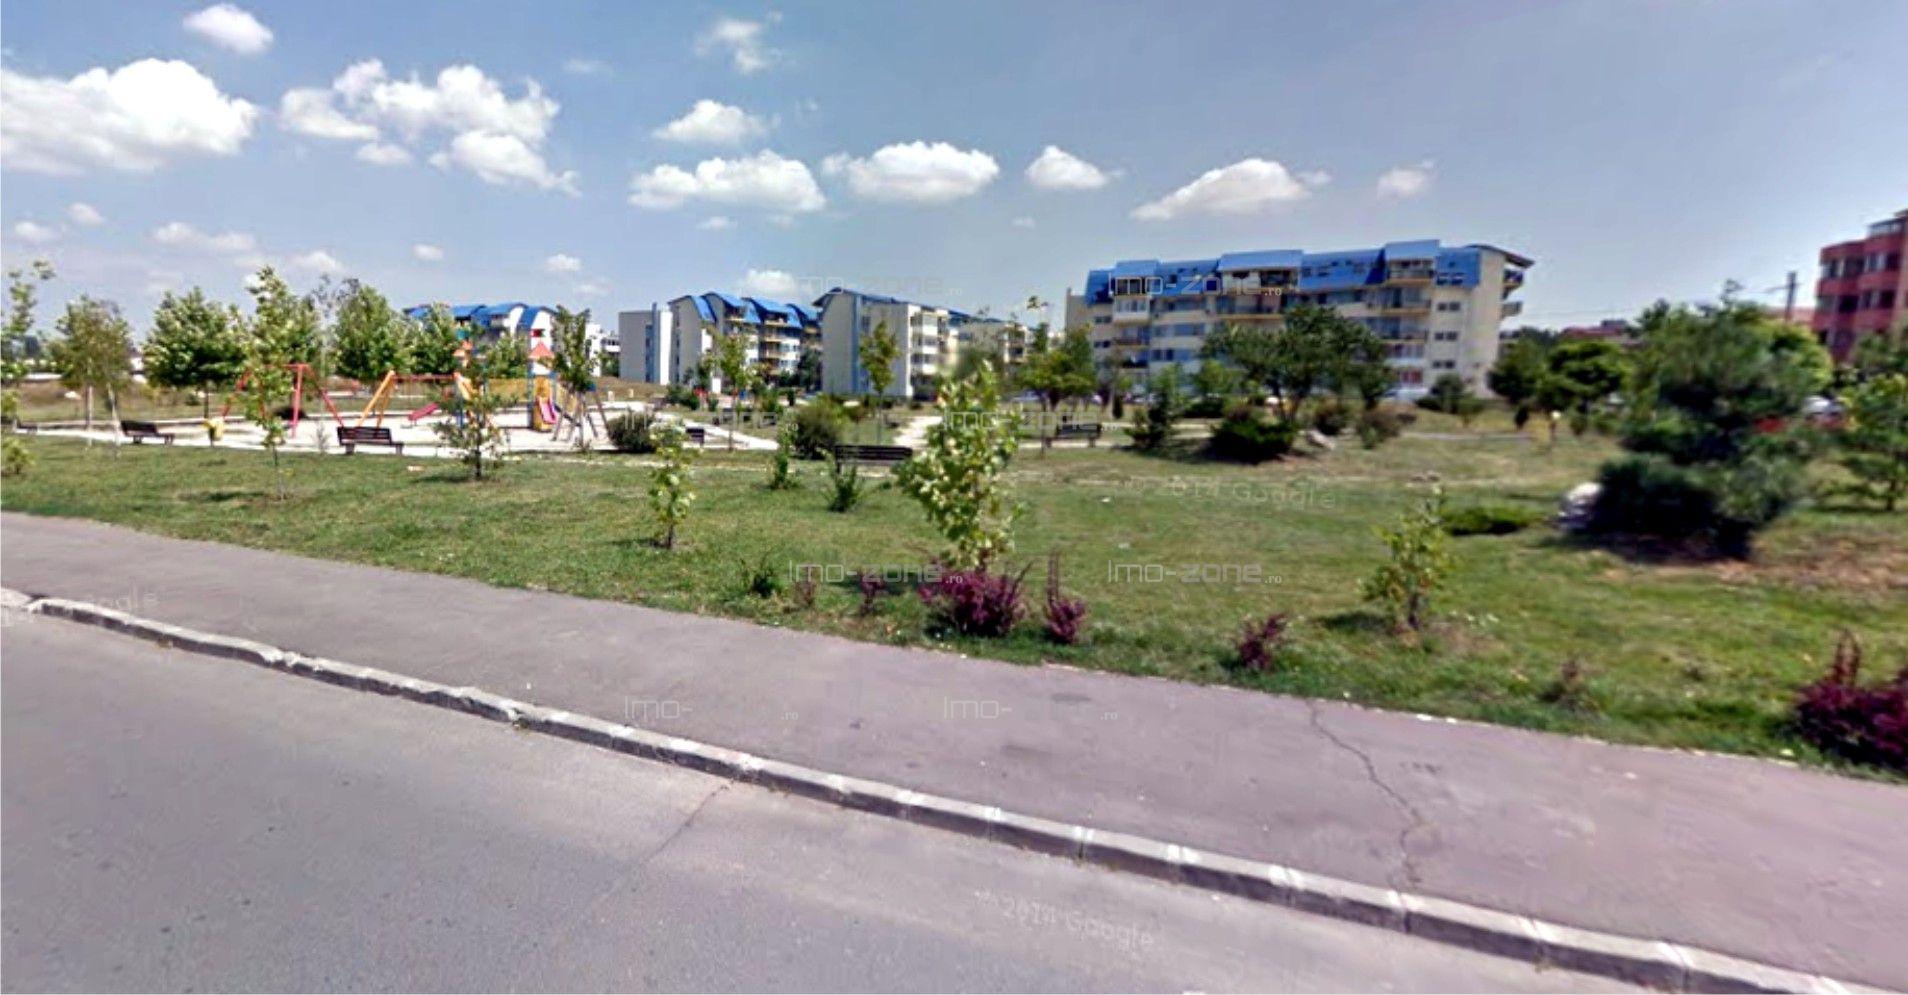 Spatiu de inchiriat Drumul Taberei, Parc ANL Brancusi, 25 mp, 320 Euro